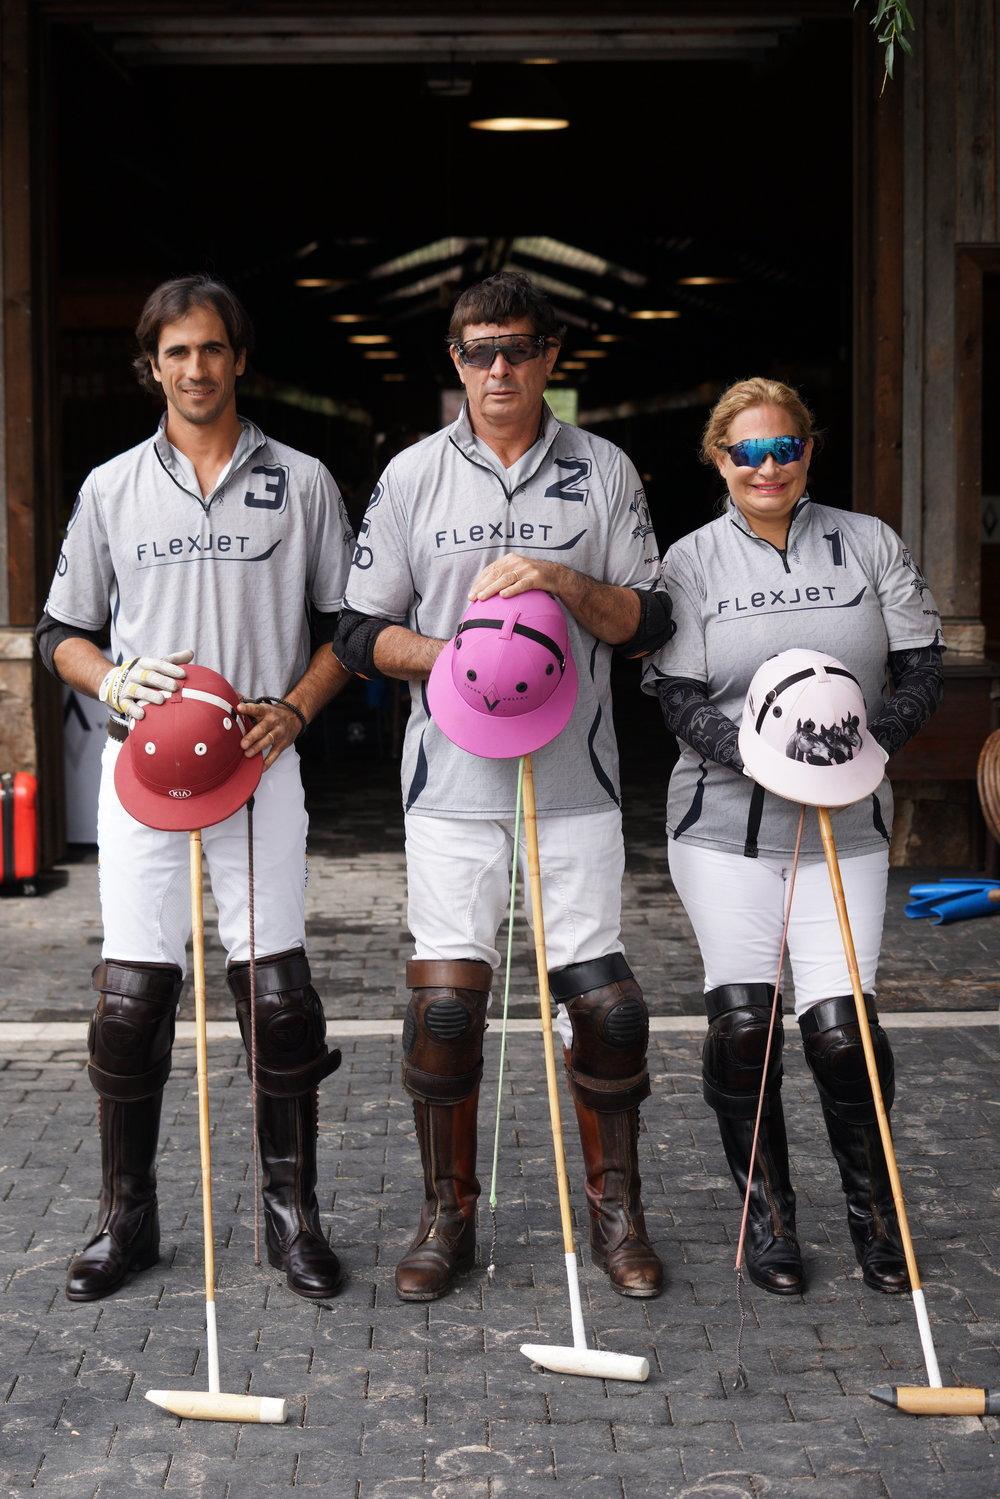 U.S. Arena Handicap champions Alejandro Novillo Astrada, MVP Juan Bollini and Melissa Ganzi of Flexjet.